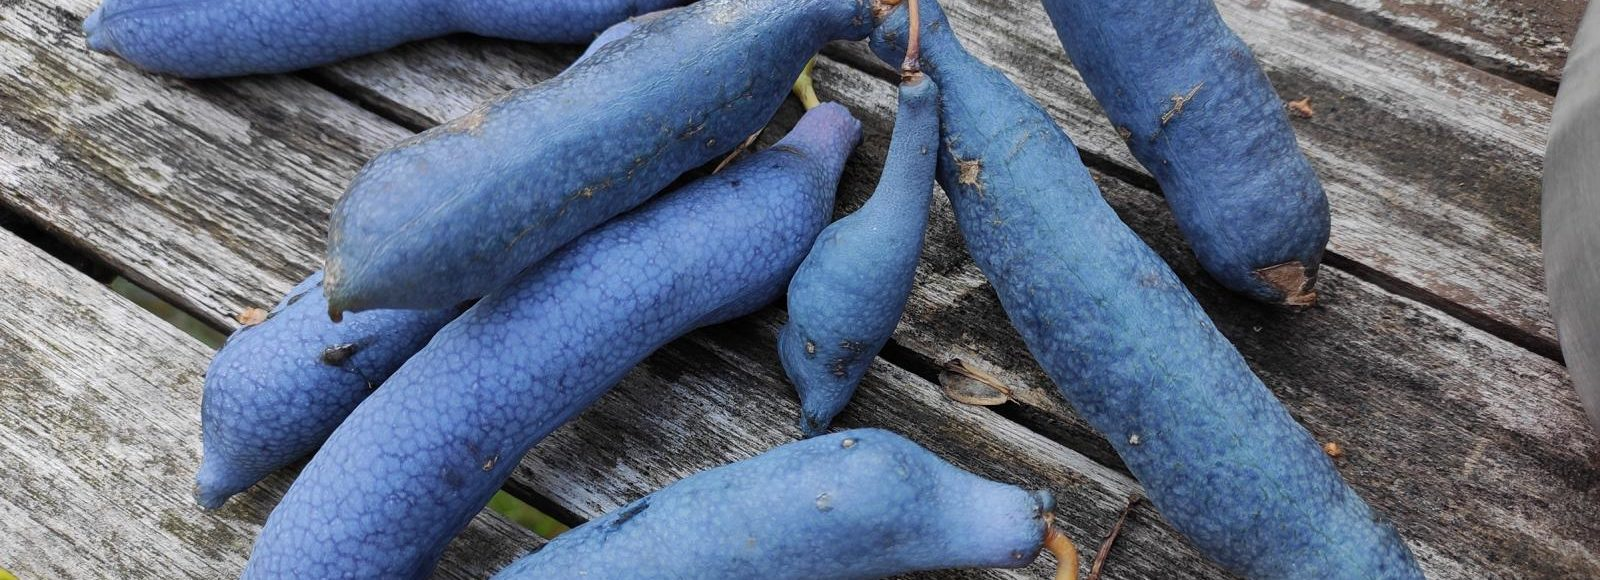 Exot vorgestellt: Die Blaugurke